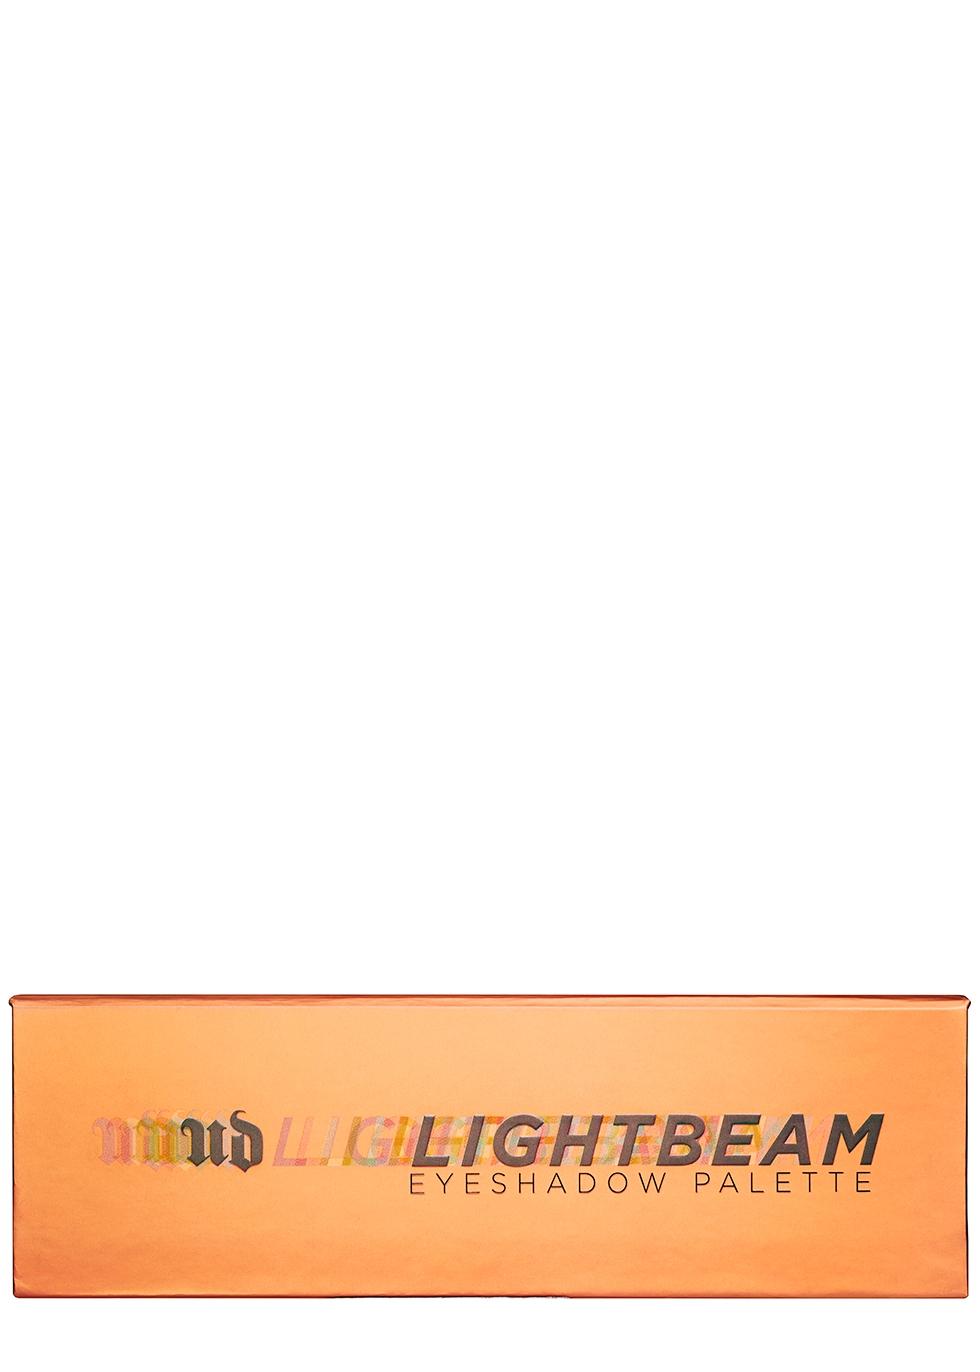 Lightbeam Eyeshadow Palette - Urban Decay